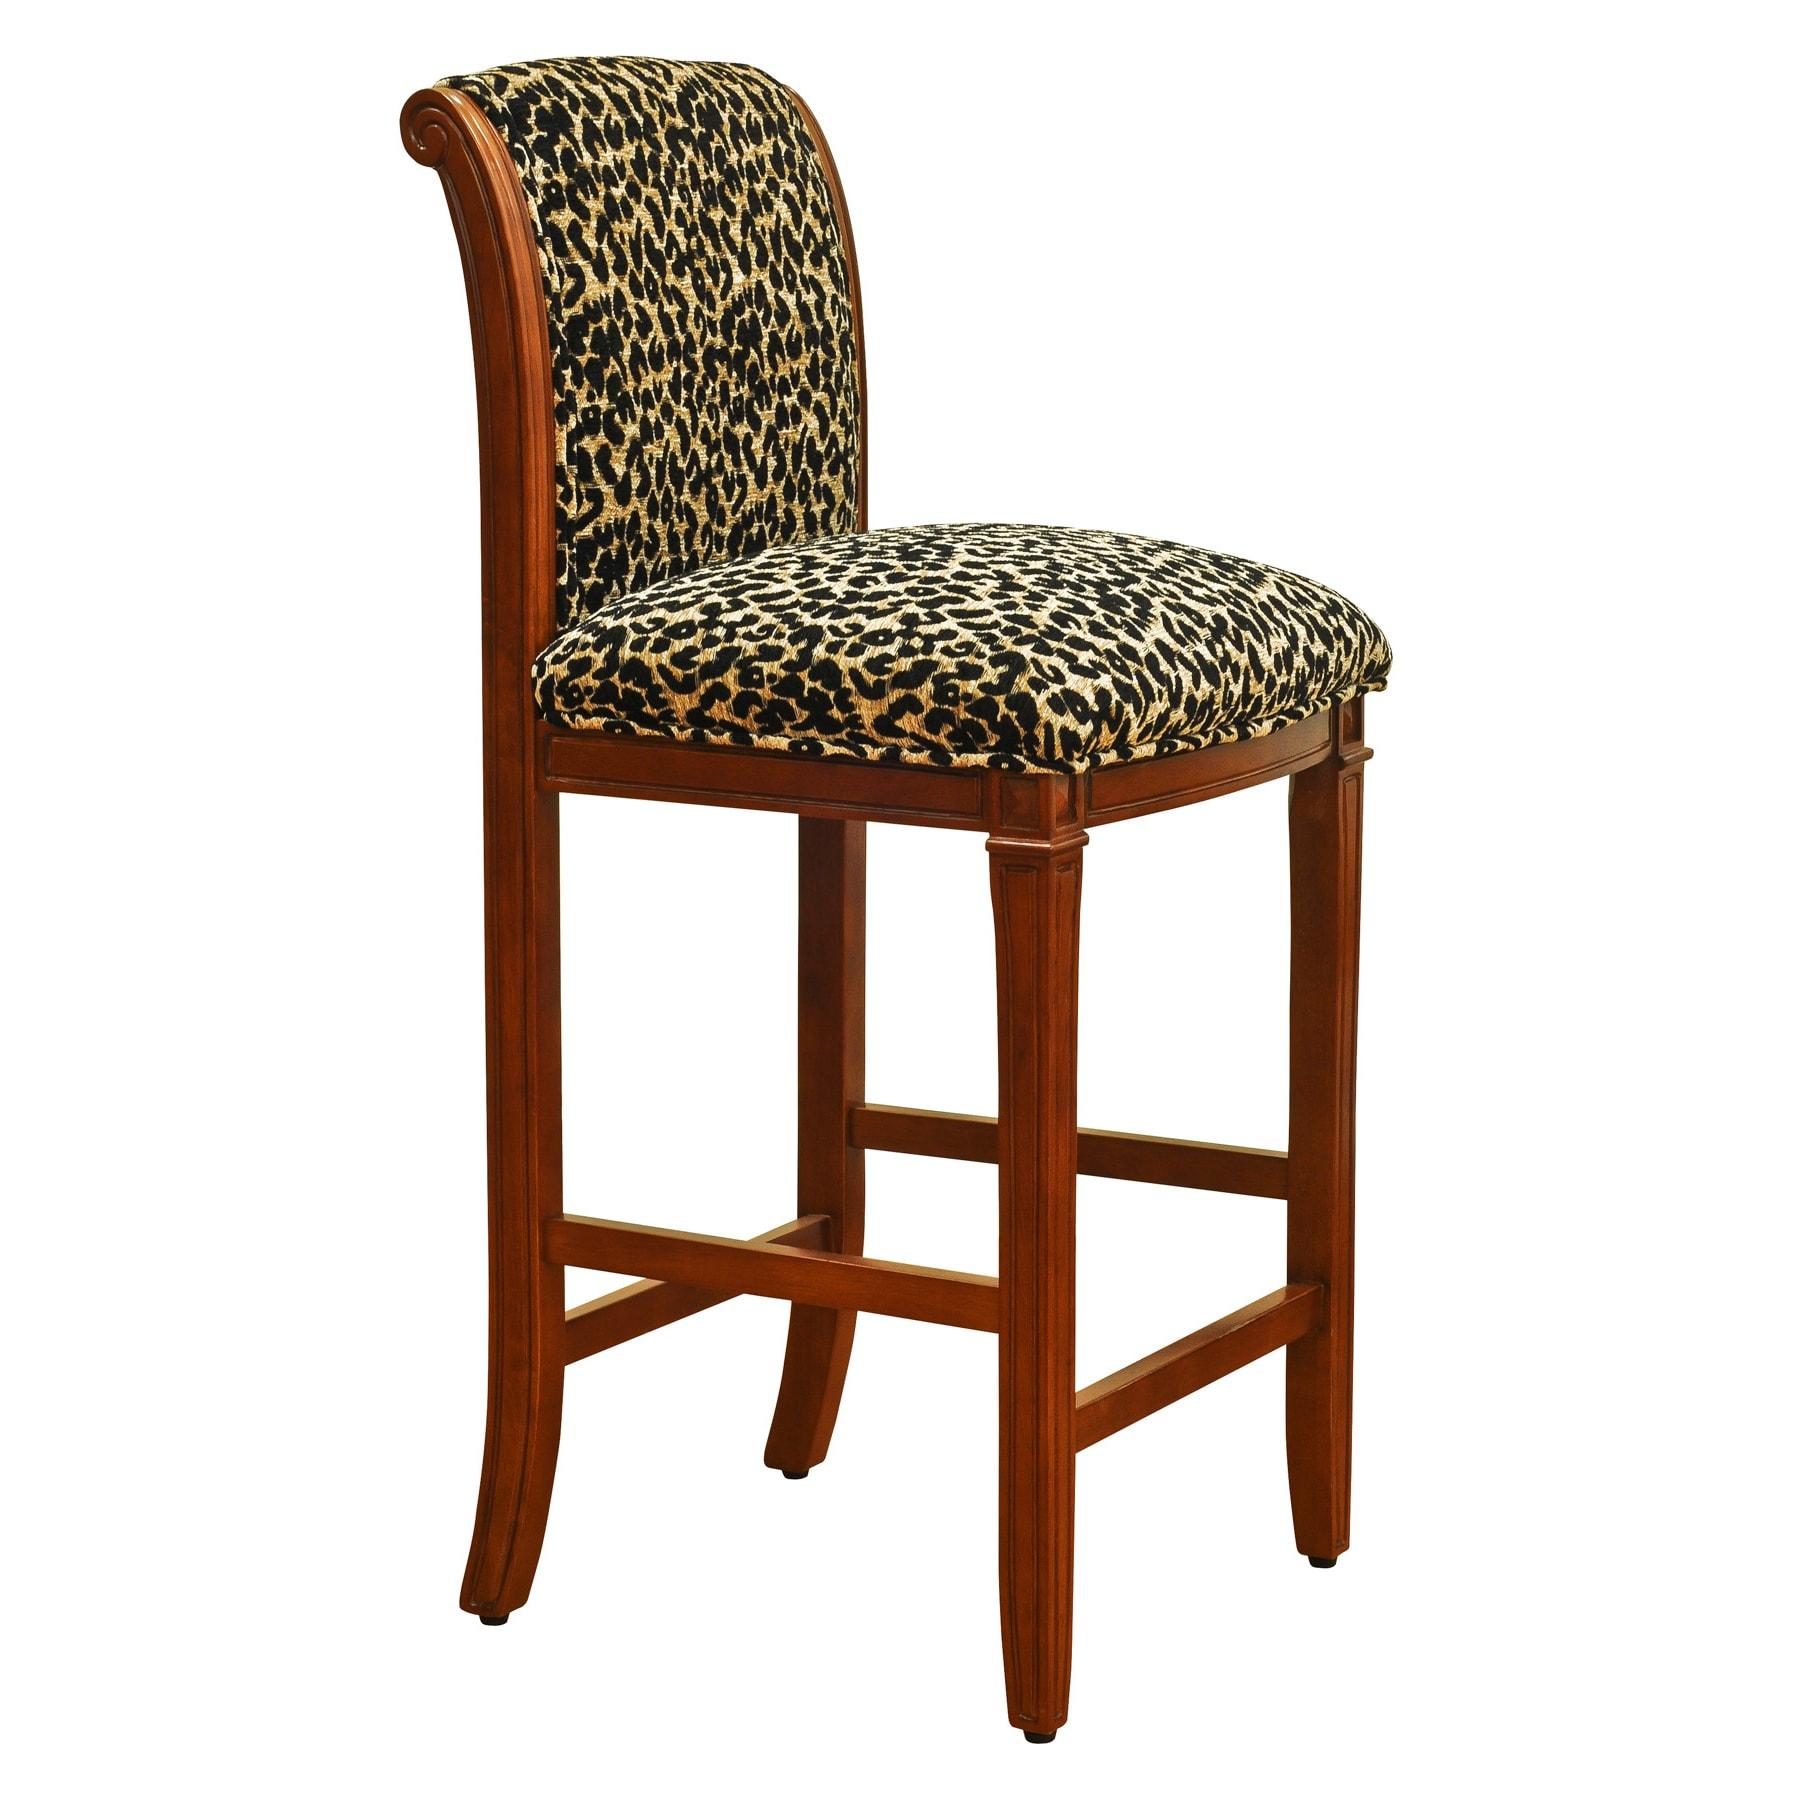 Leopard Animal Print Bar Stool Overstock Shopping  : Leopard Animal Print Bar Stool 12382d98 6c01 4942 89c6 5ae971f0f574 from www.overstock.com size 1800 x 1800 jpeg 234kB